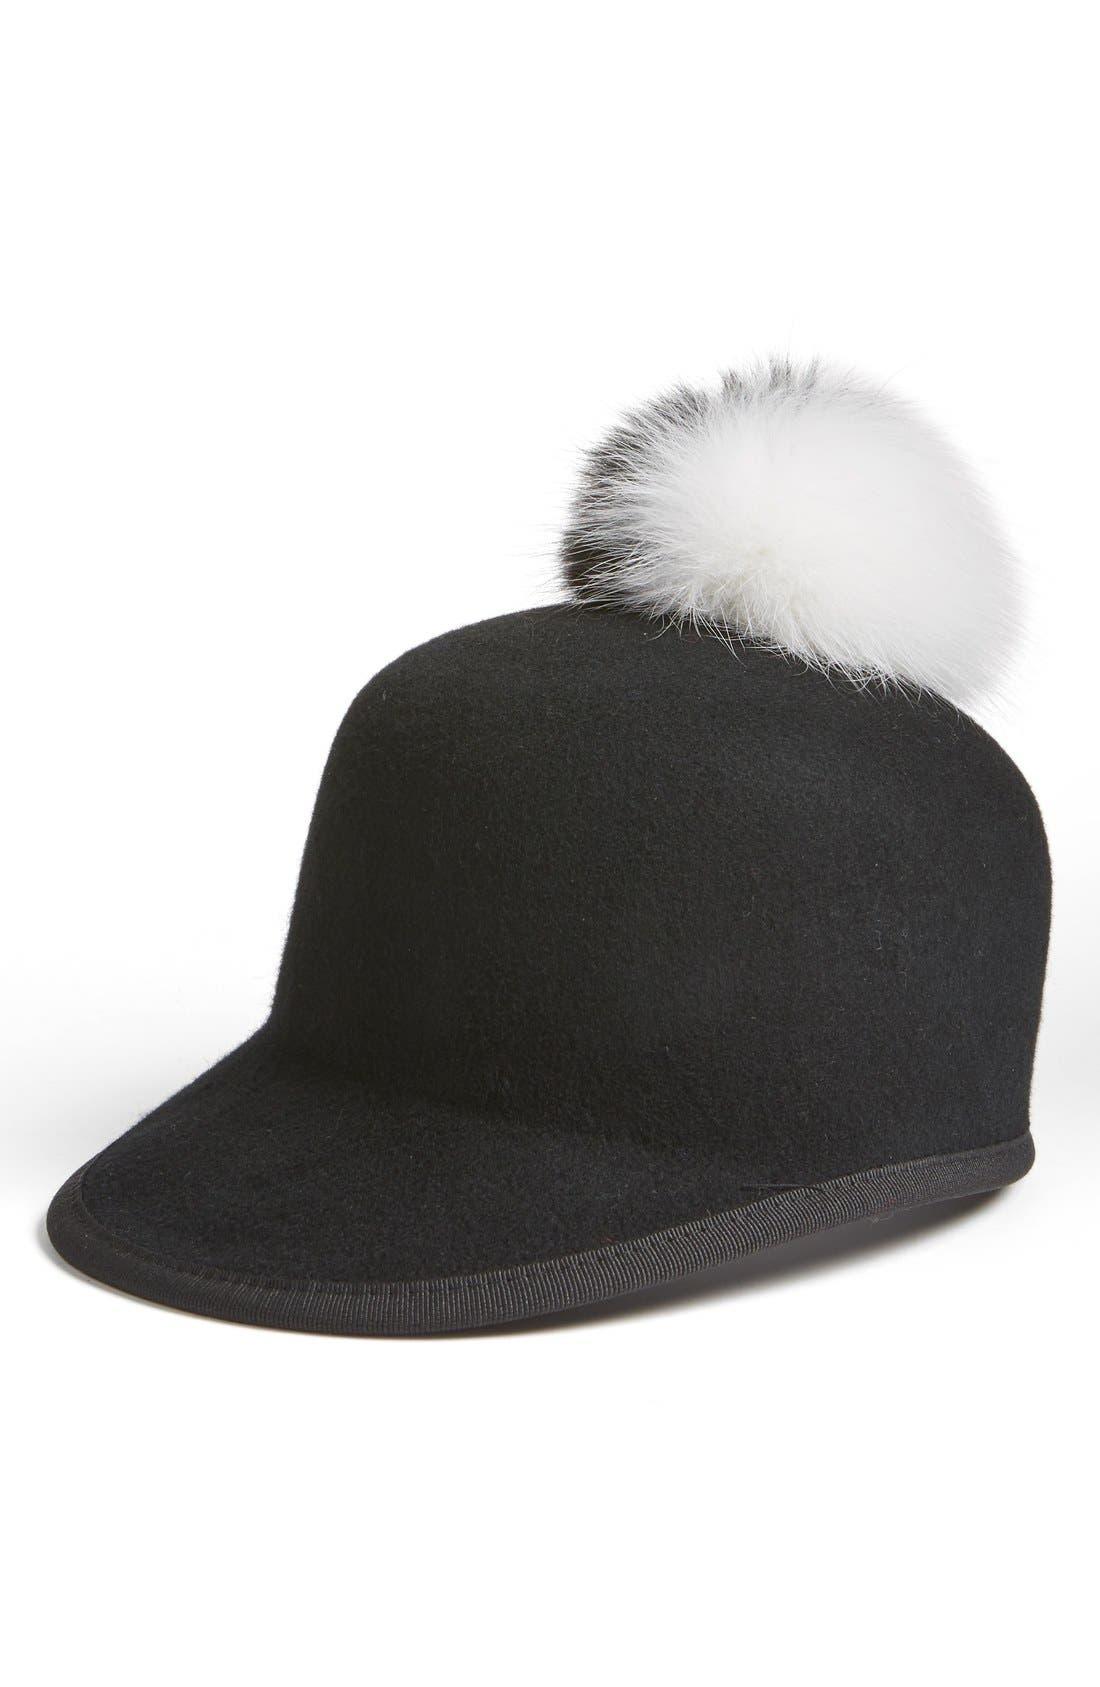 Alternate Image 1 Selected - Helene Berman Genuine Fox Fur Pompom & Wool Cap